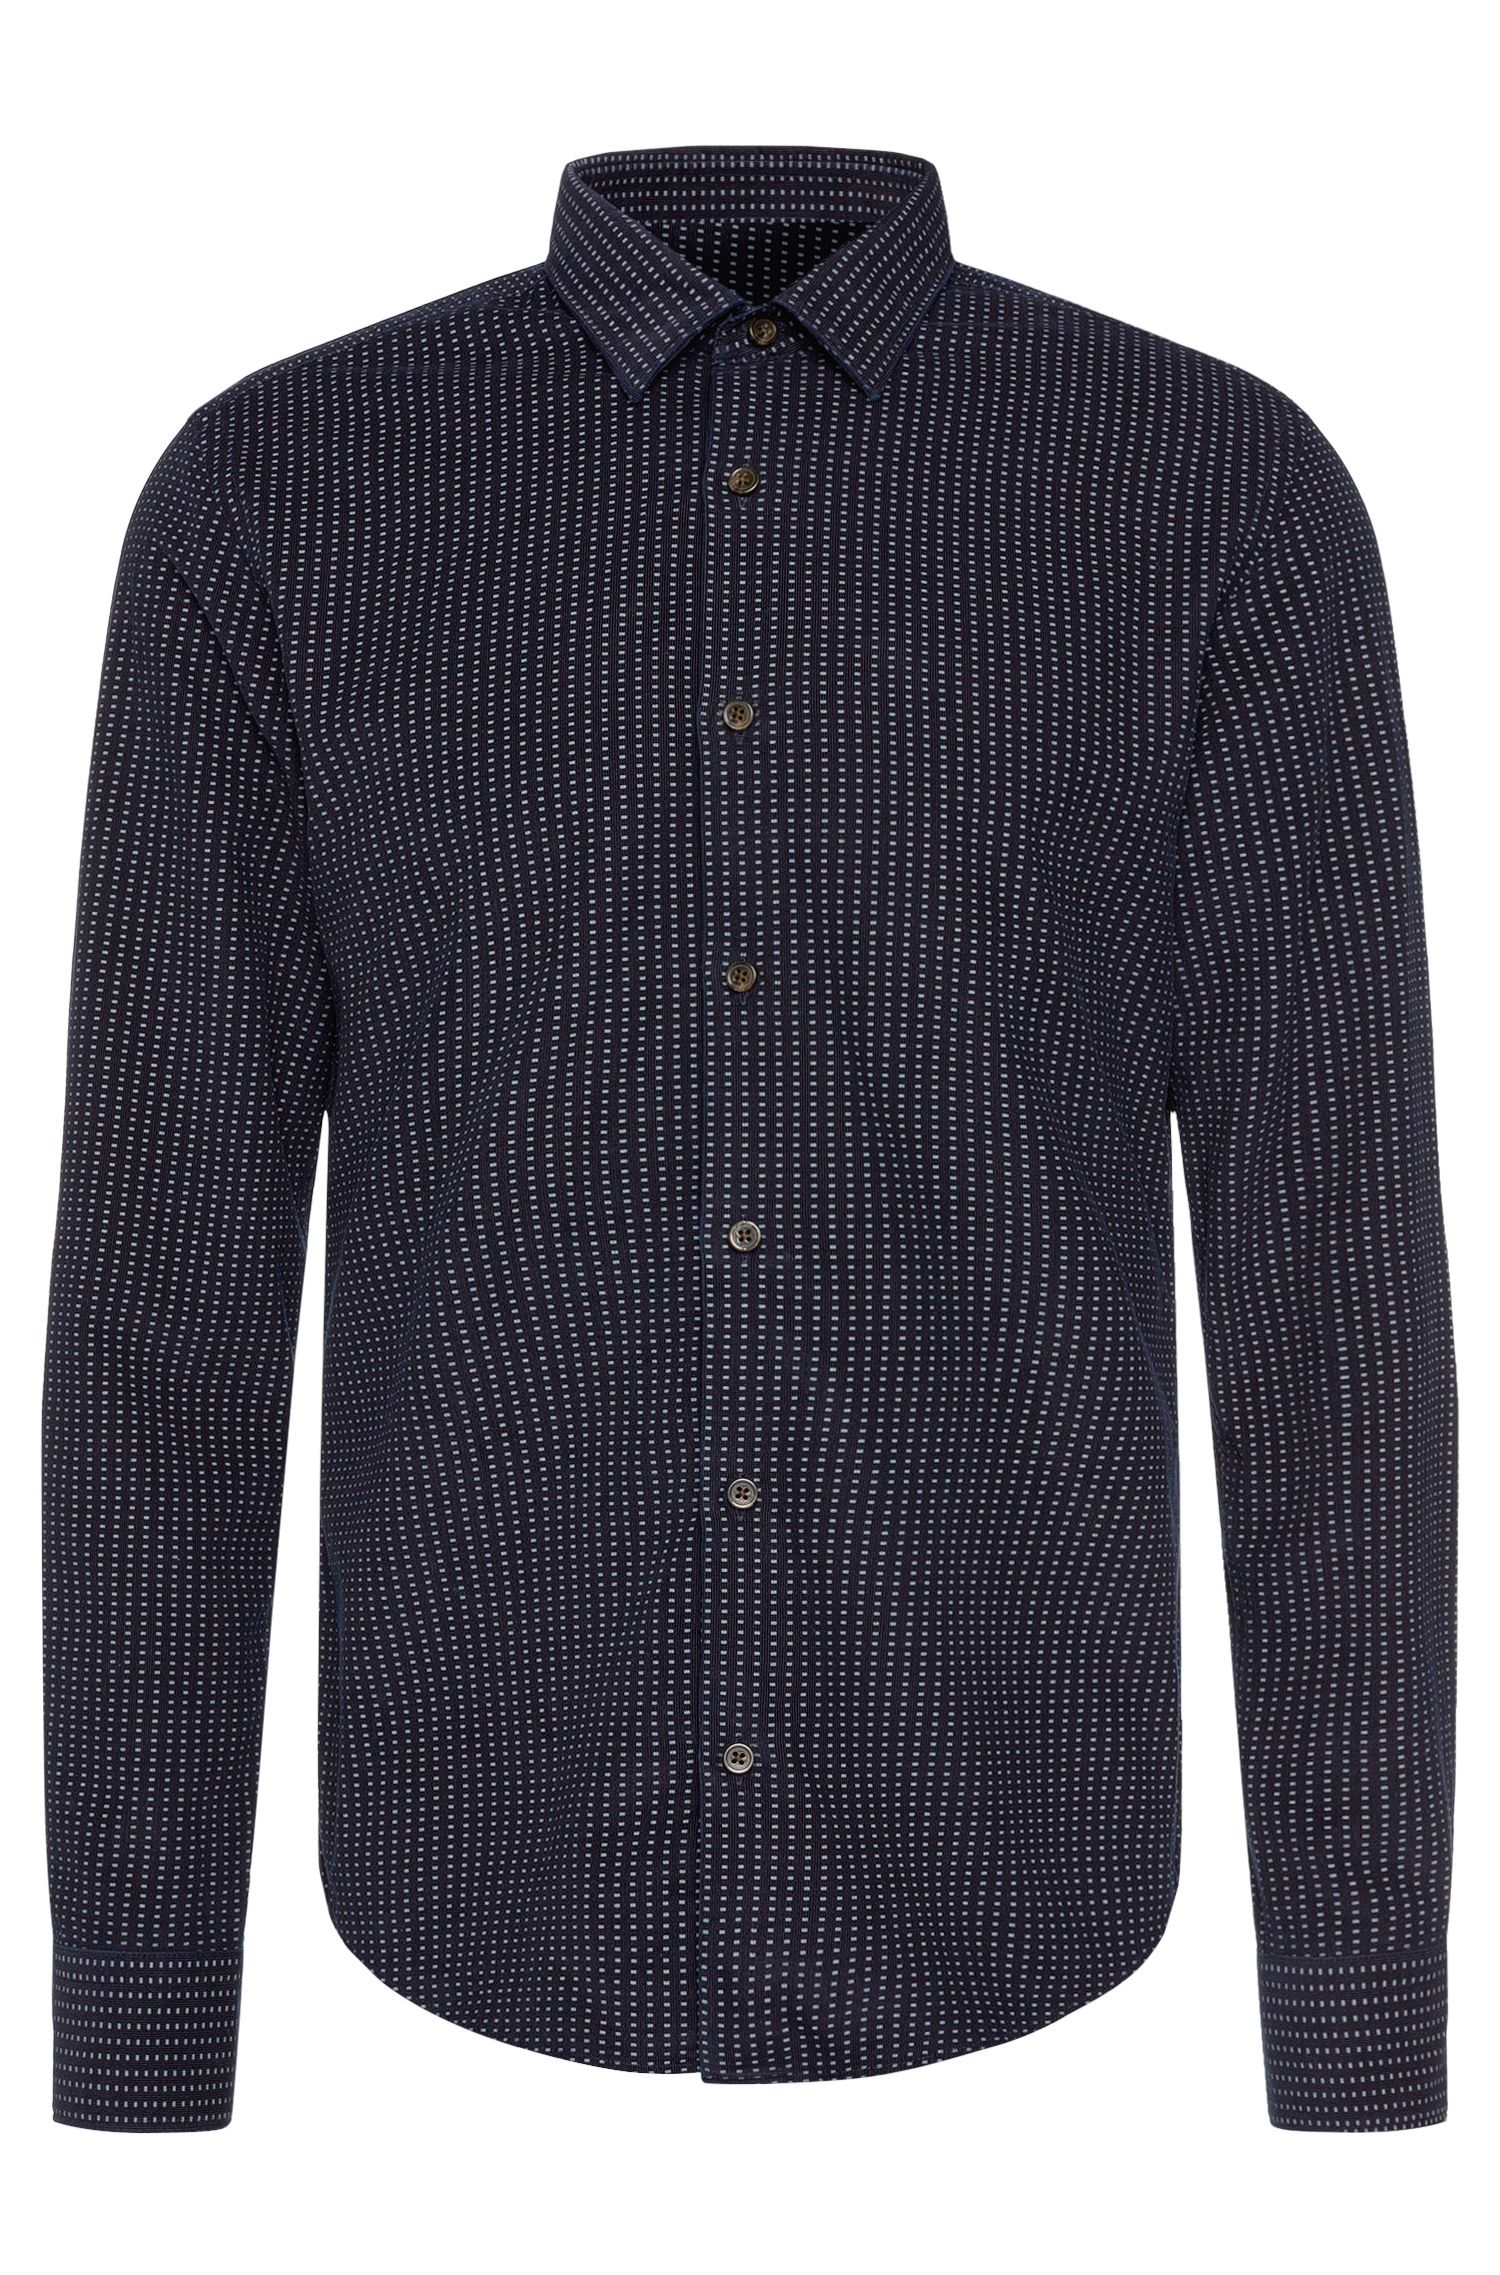 Patterned slim-fit shirt in cotton: 'Reid_F'